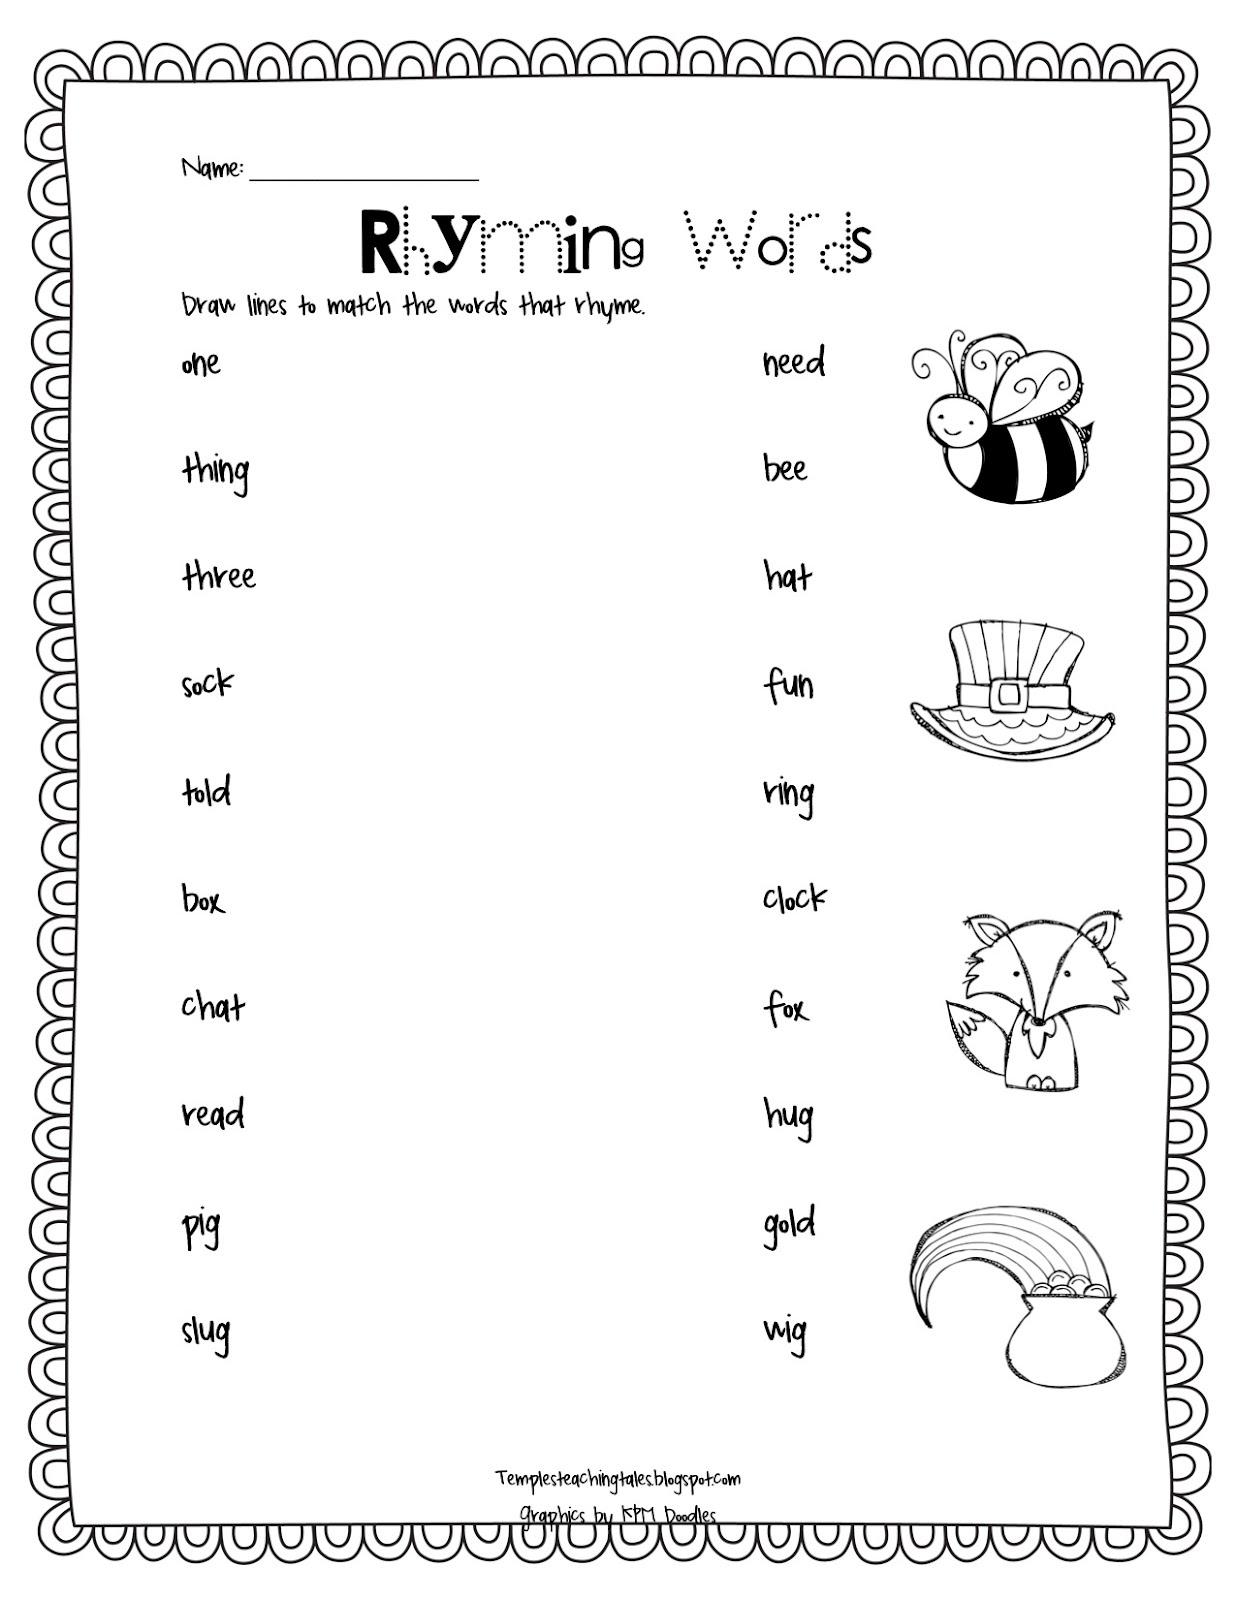 Rhyming Words For Kids Worksheets